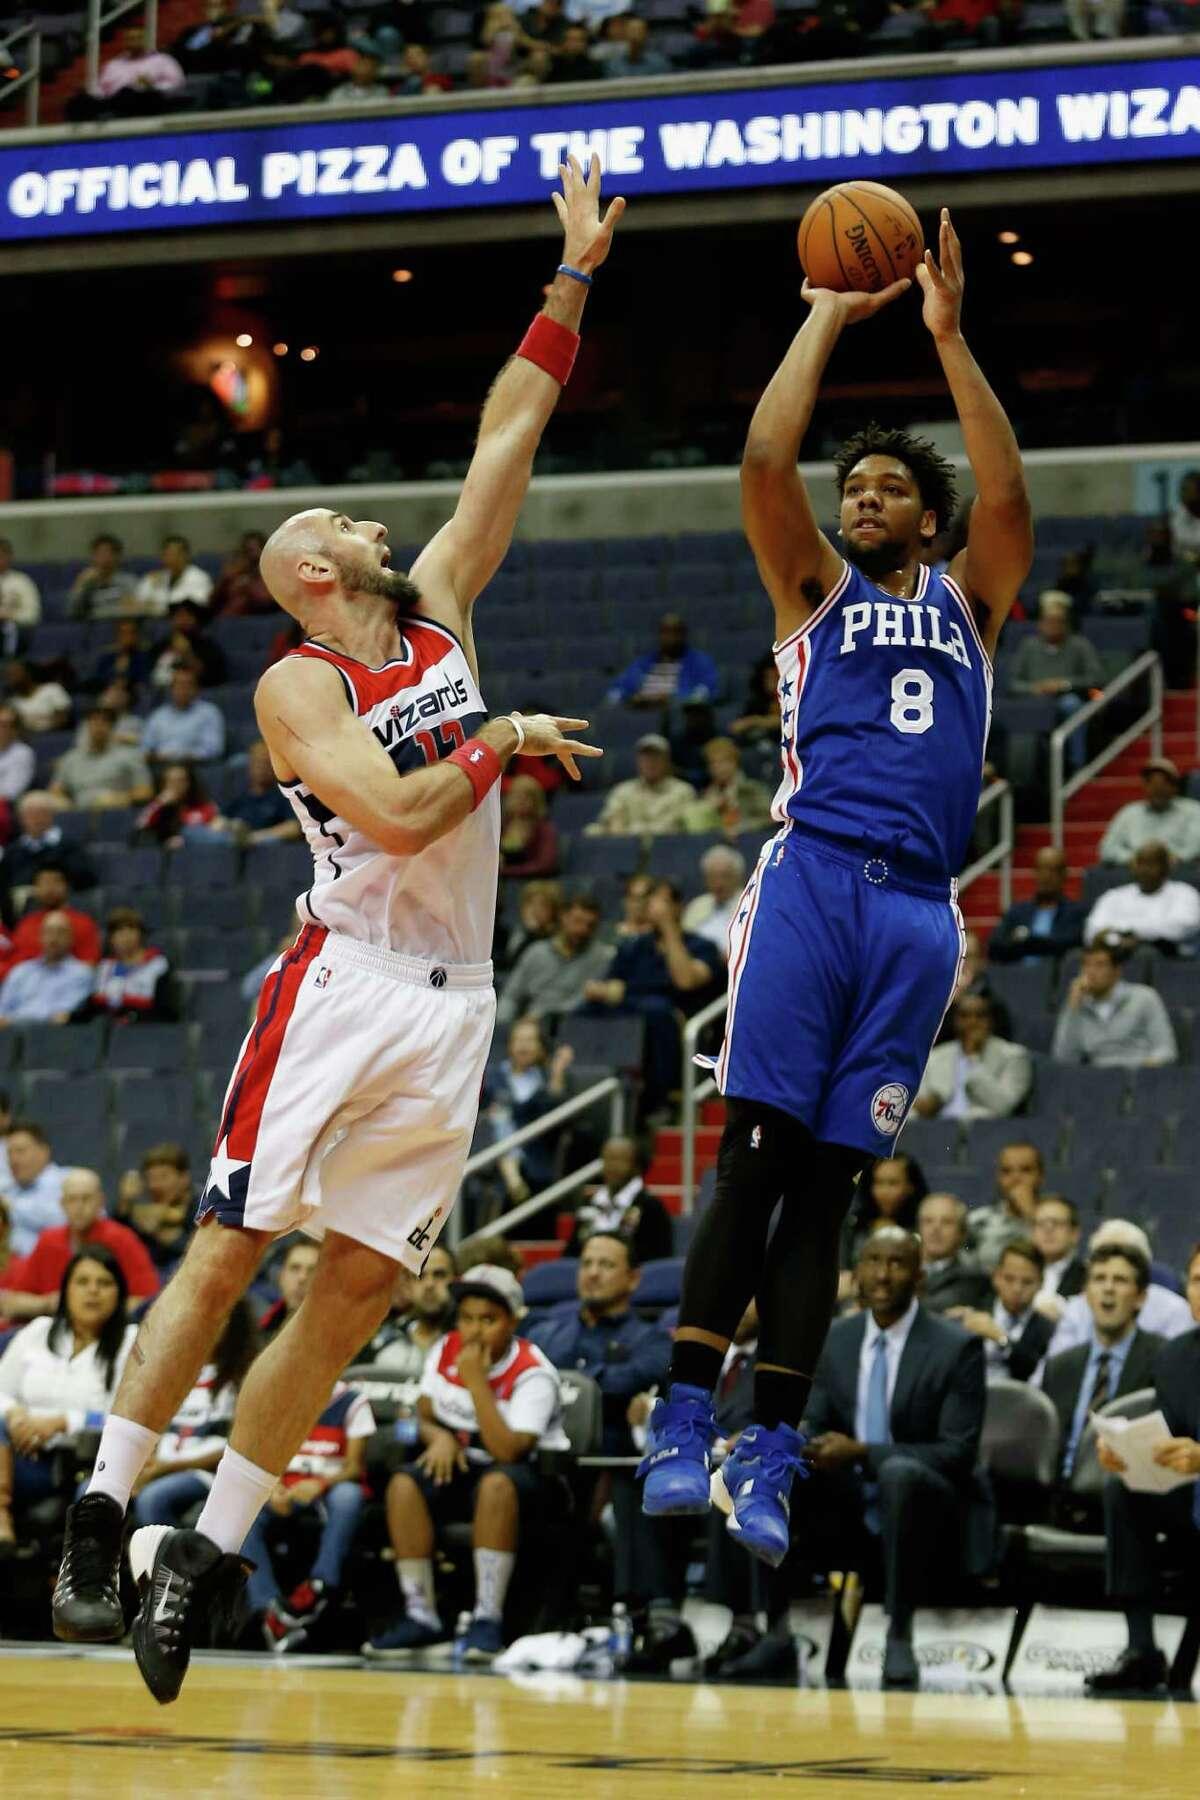 29. Philadelphia 76ers Average home ticket: $97.59 Average road ticket: $136.53 Most expensive:1/10/16 vs. Cavaliers, $230 Least expensive: 11/11/15 vs. Raptors, $62